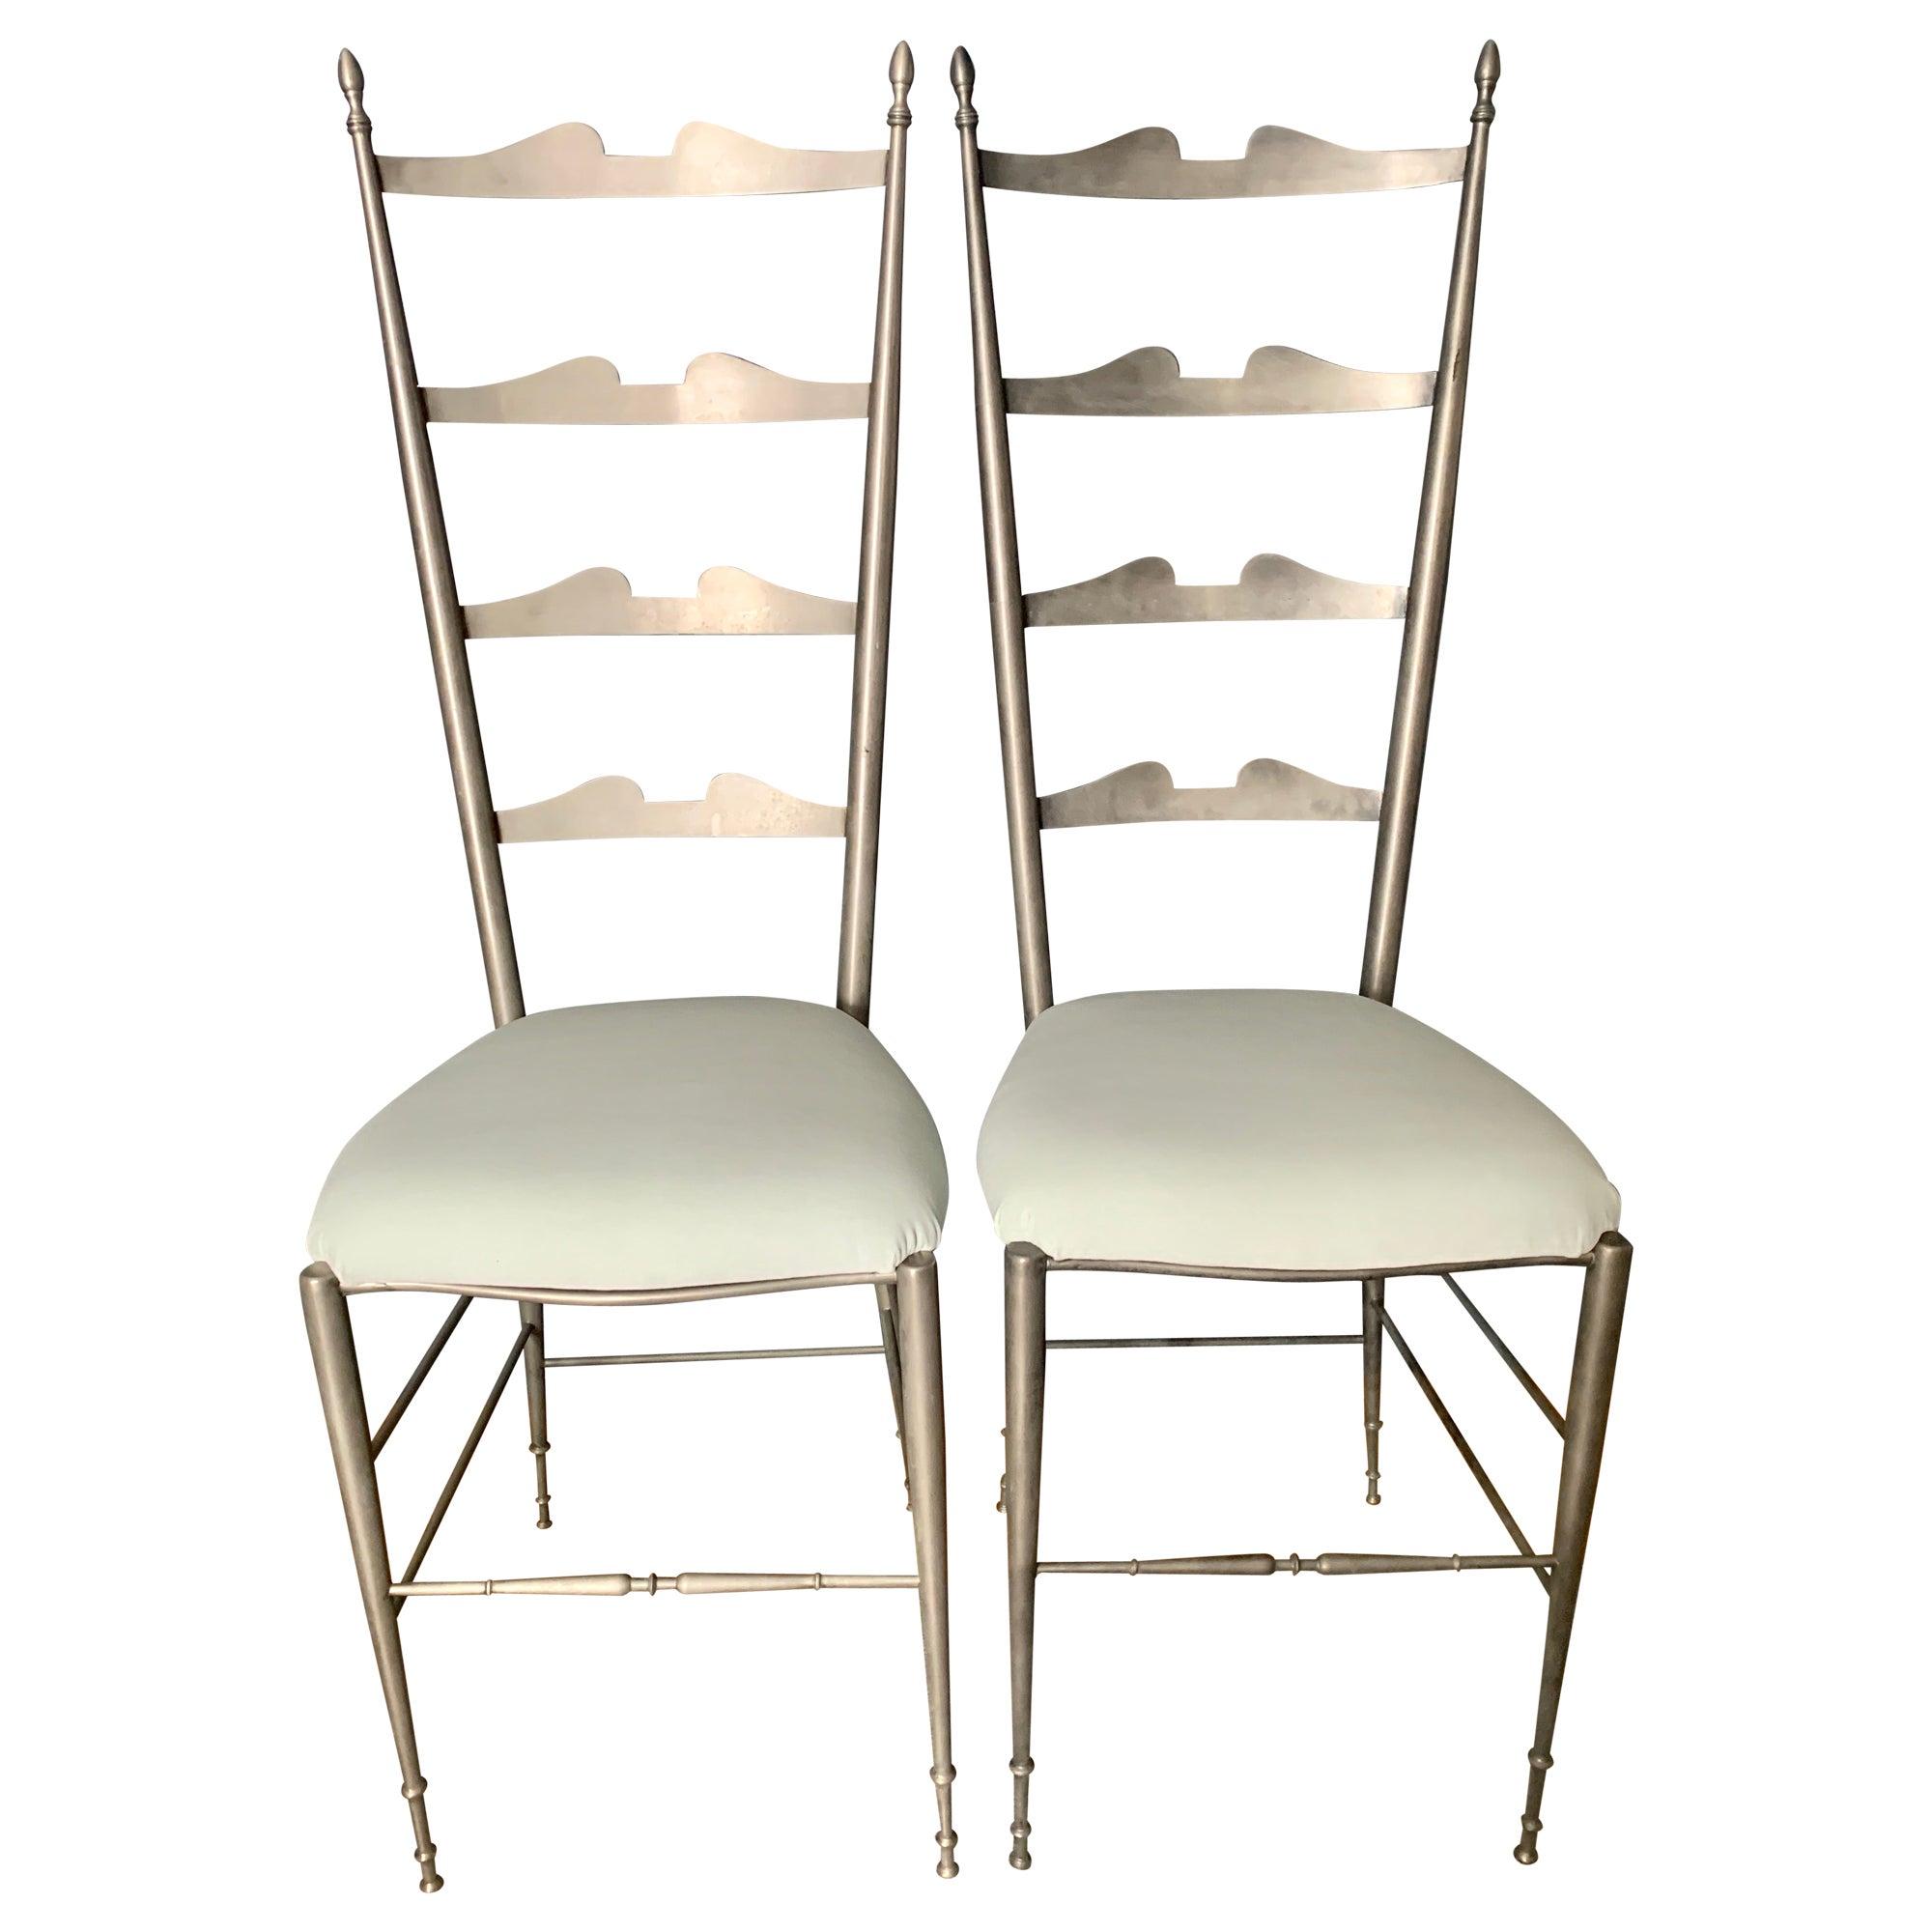 Pair of Italian Ladder Back Chiavari Chairs in Silver Metal